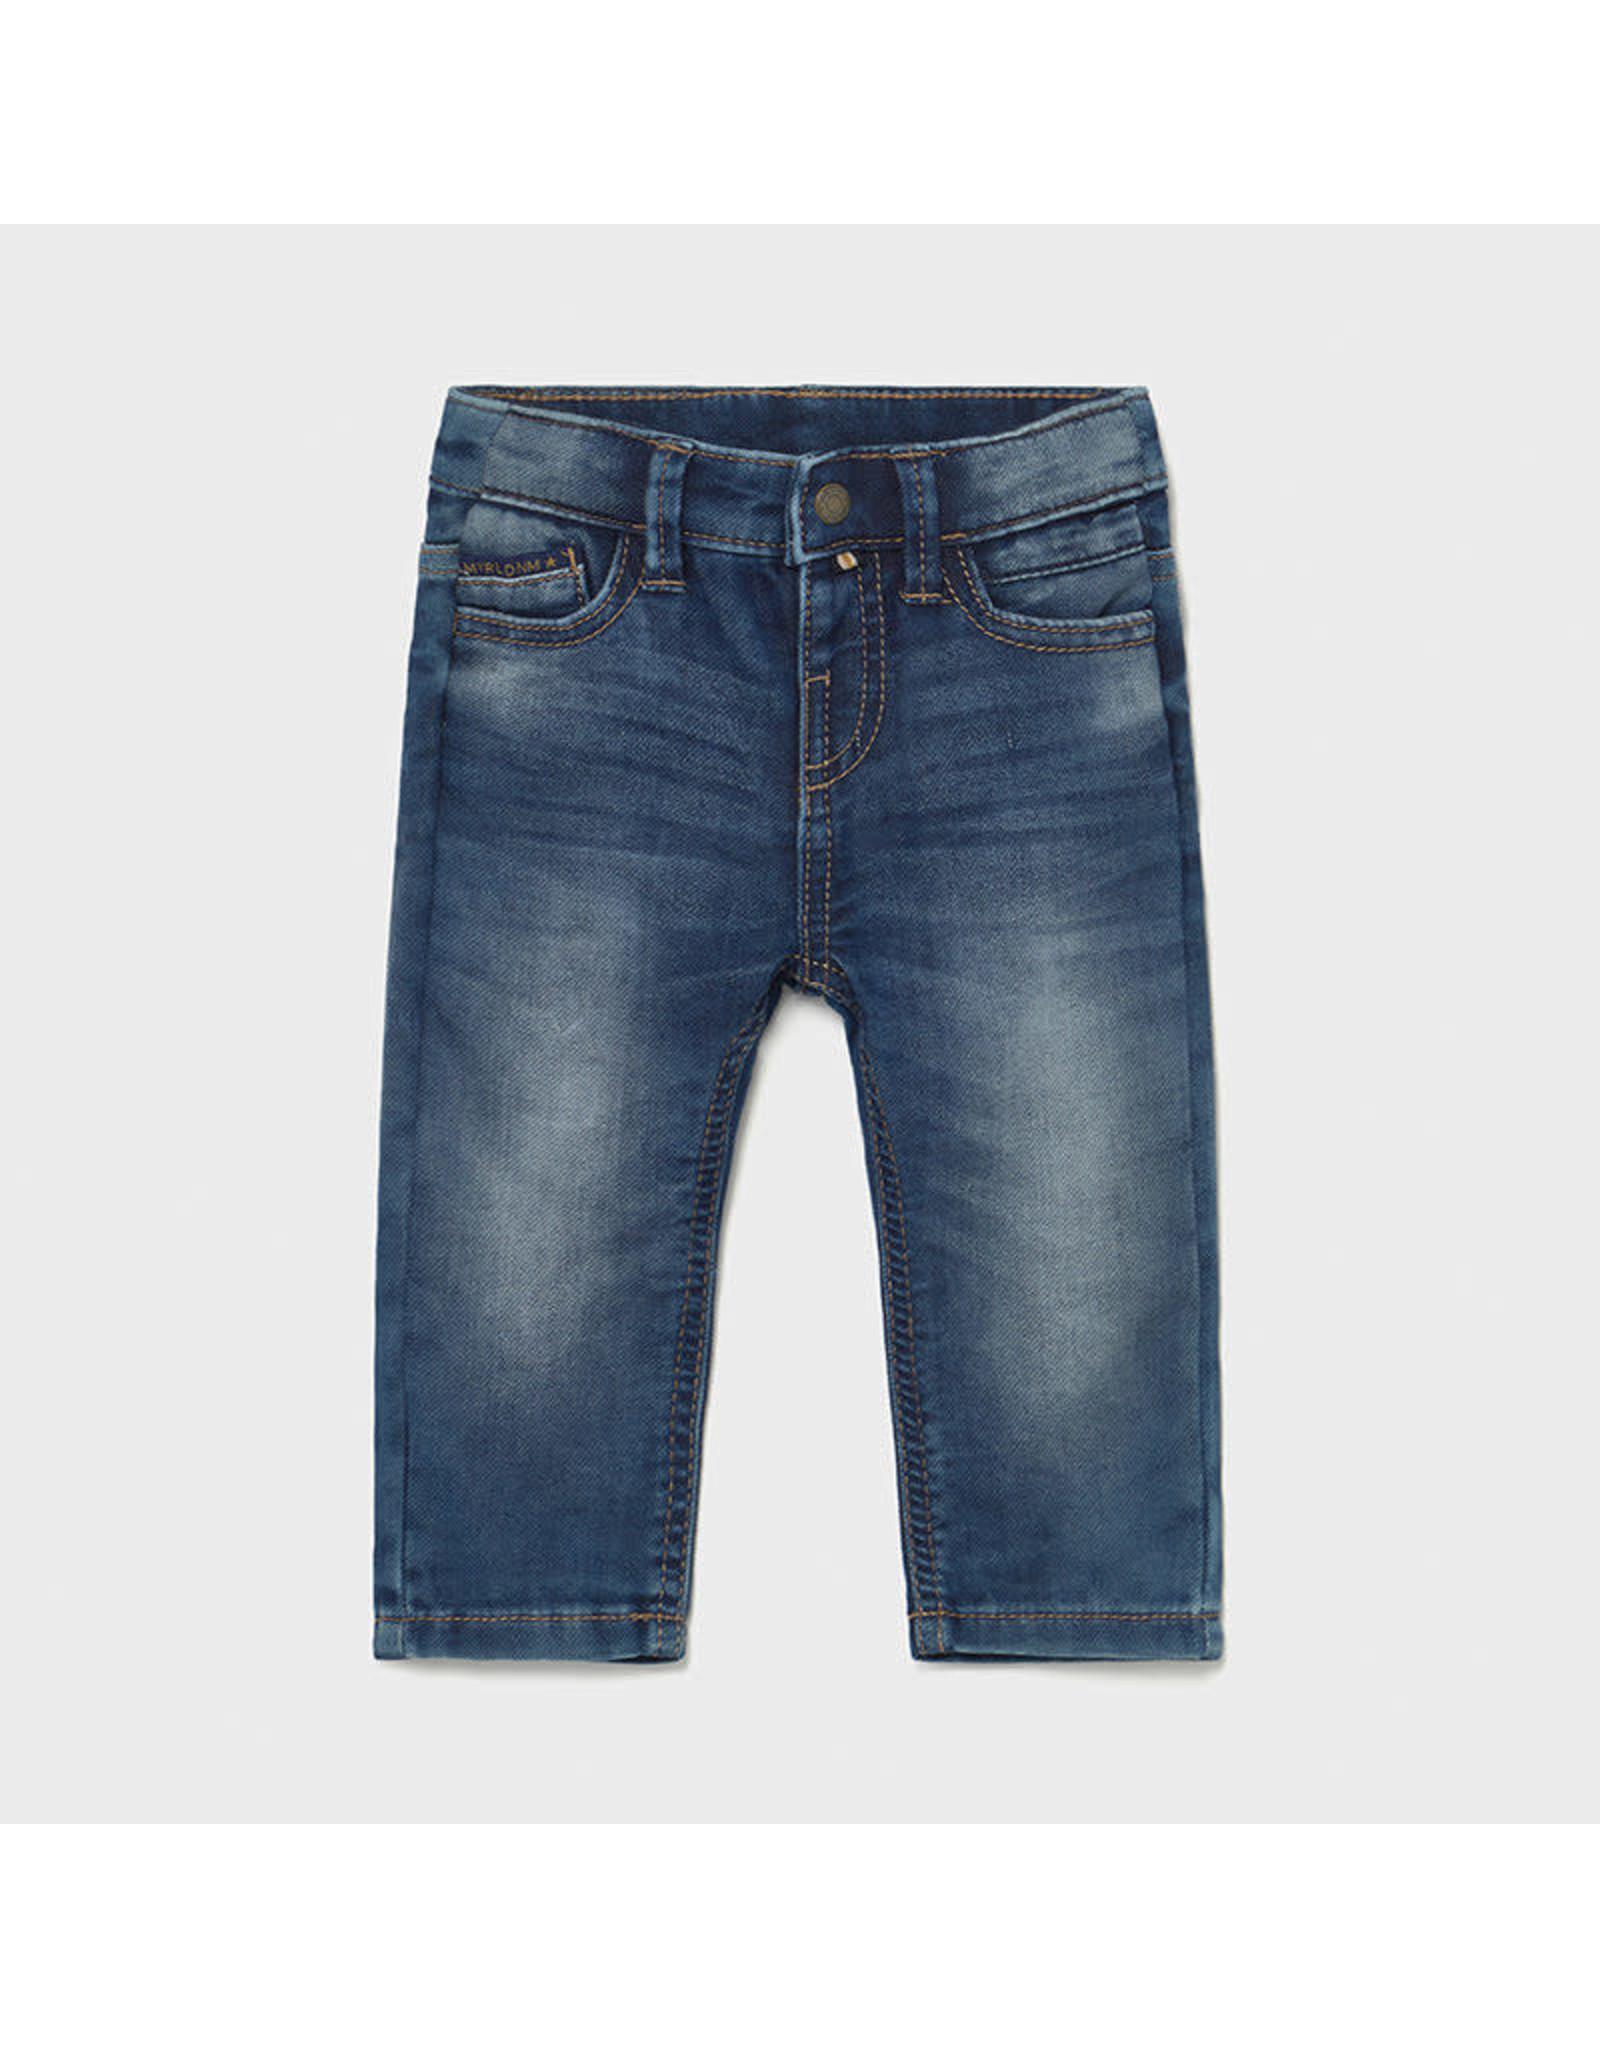 Mayoral Soft denim jeans